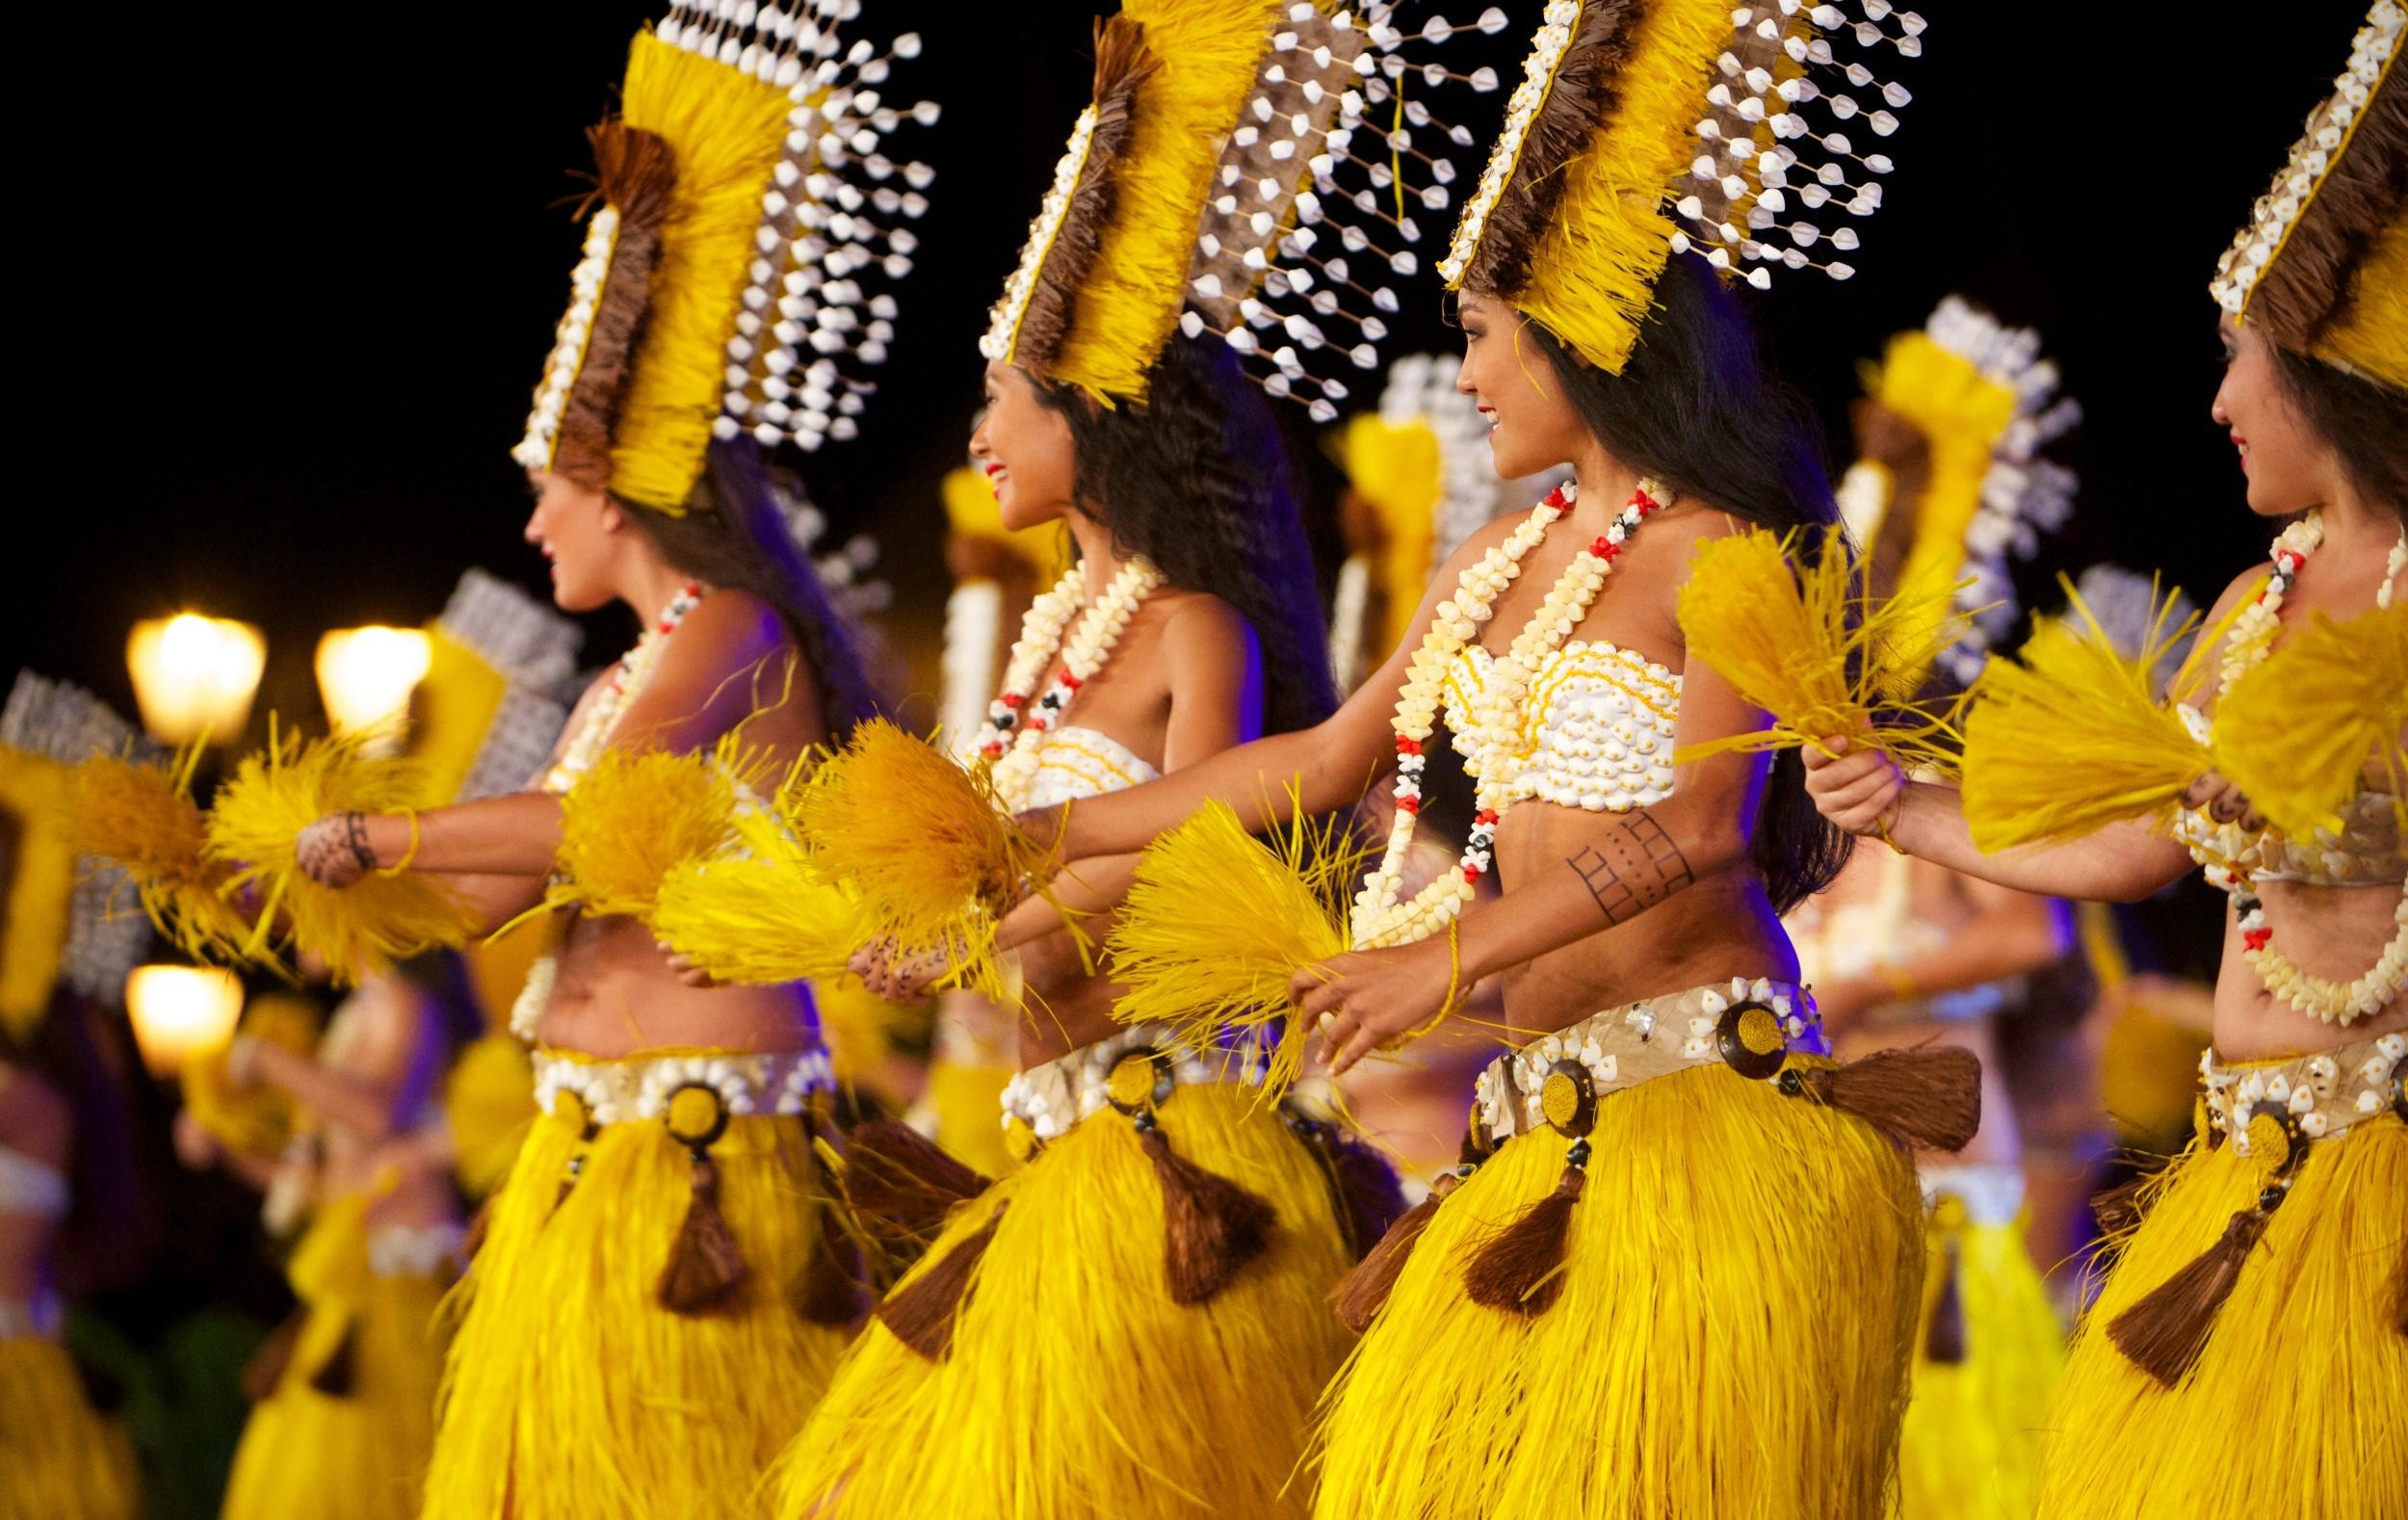 https://tahititourisme.fr/wp-content/uploads/2021/10/ic-tahiti-soires-merveilleuses_45748193702_o.jpg